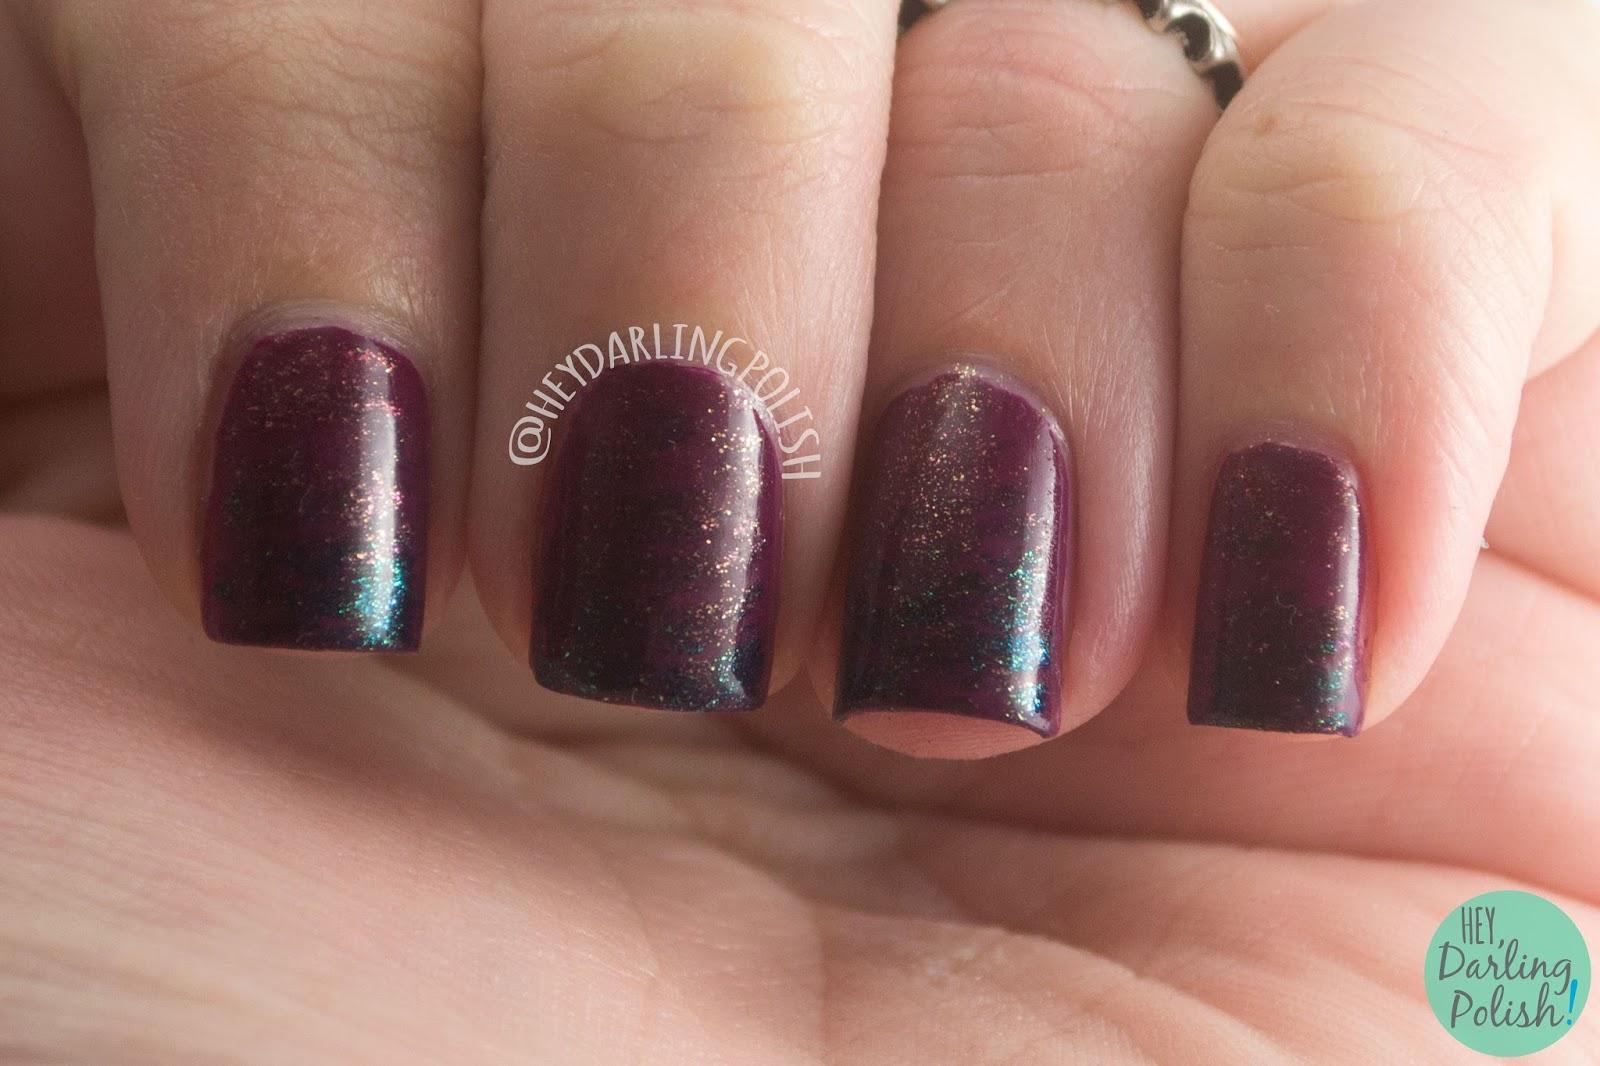 nails, nail art, nail polish, zoya, brushstrokes, hey darling polish, fall, autumn, gradient